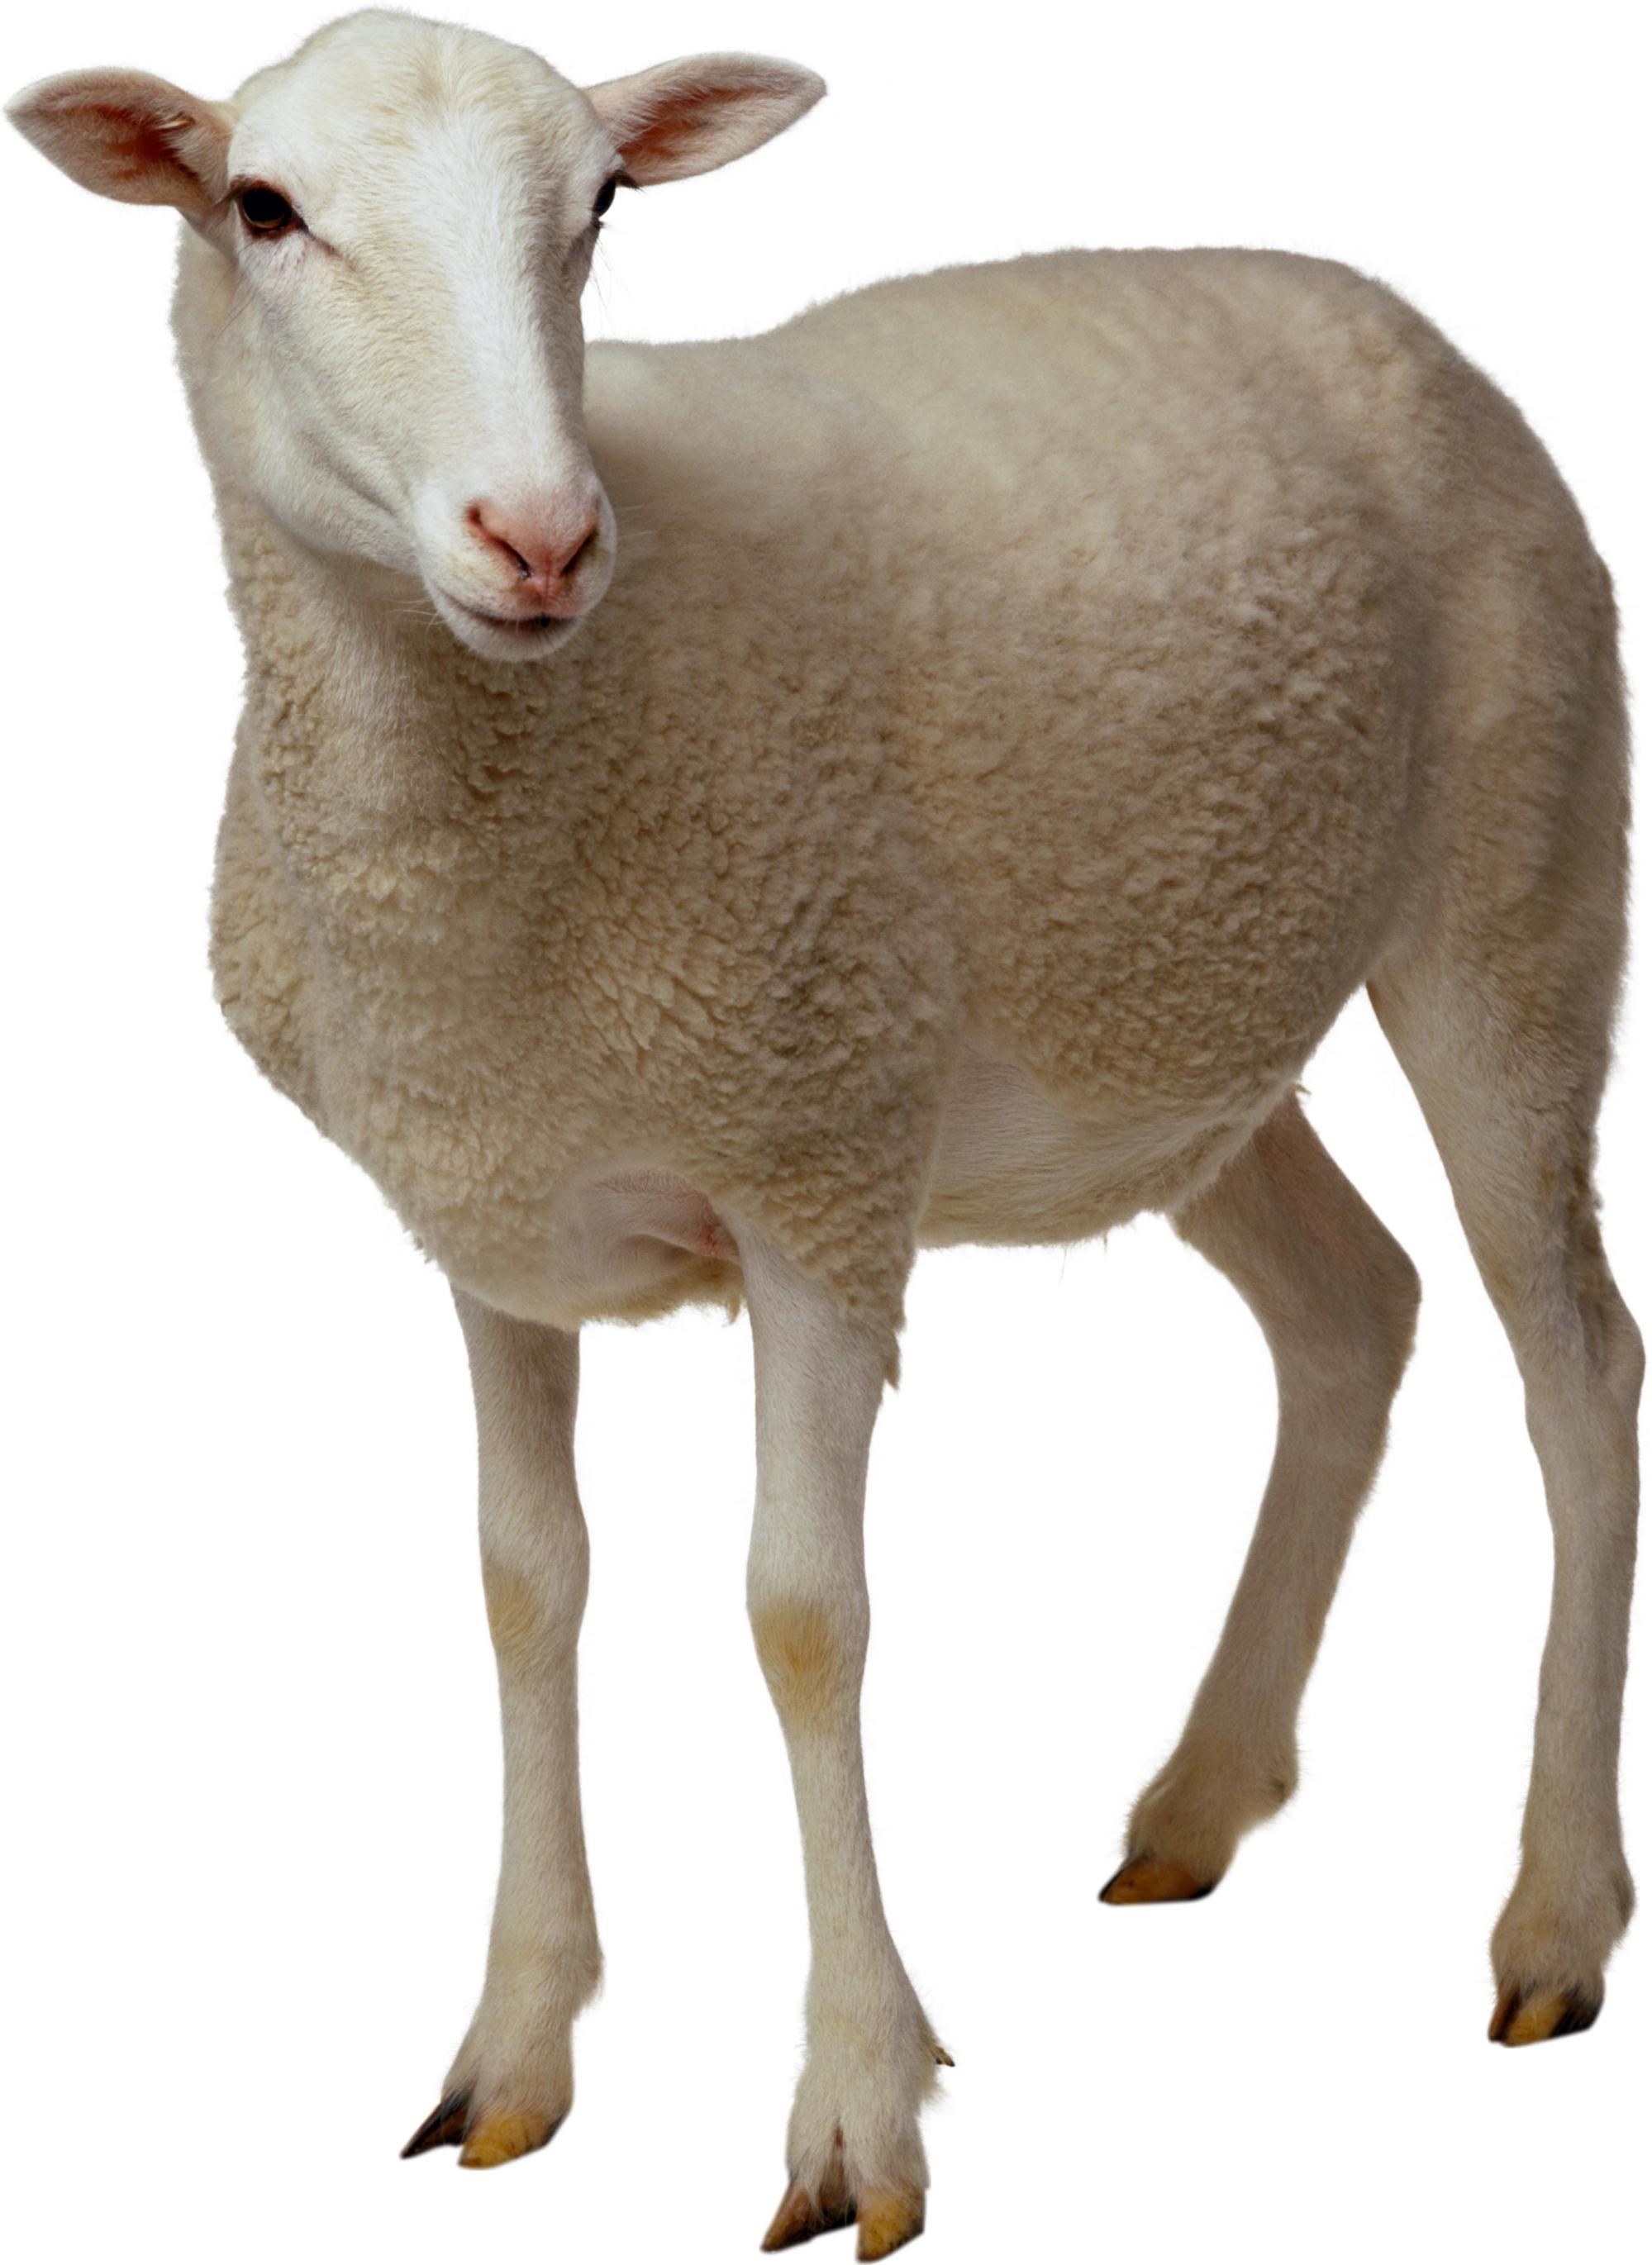 5f05721cc8991c96f75d45c7360eb858 · sheep PNG2717 - Cute Lamb PNG HD